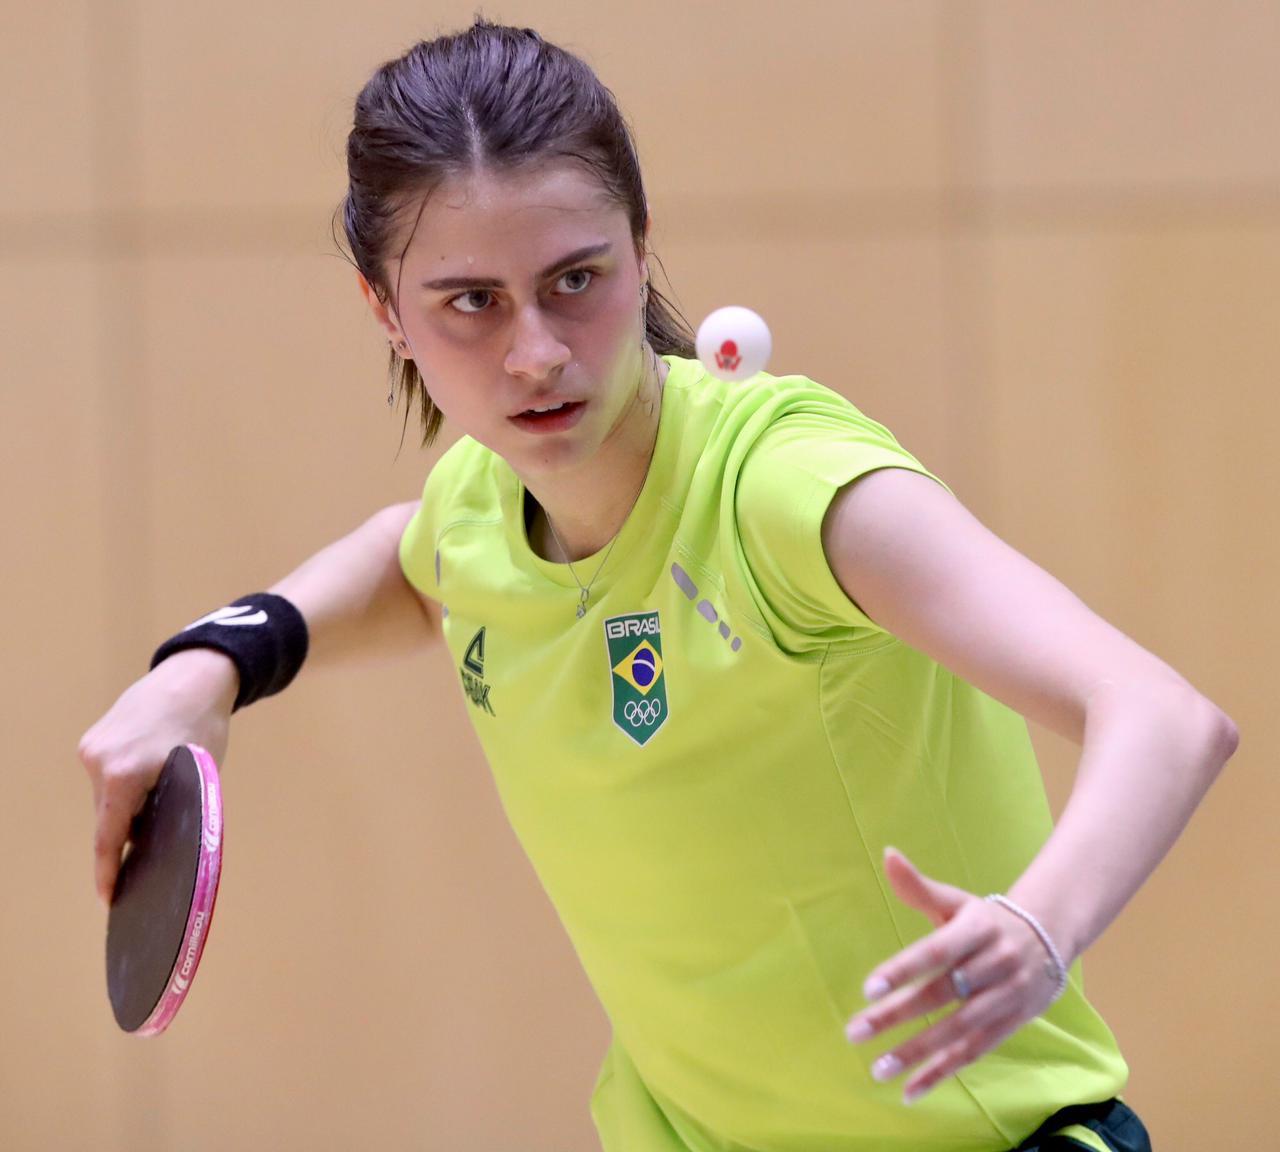 Gustavo Tsuboi vence romeno e avança; Bruna Takahashi é eliminada